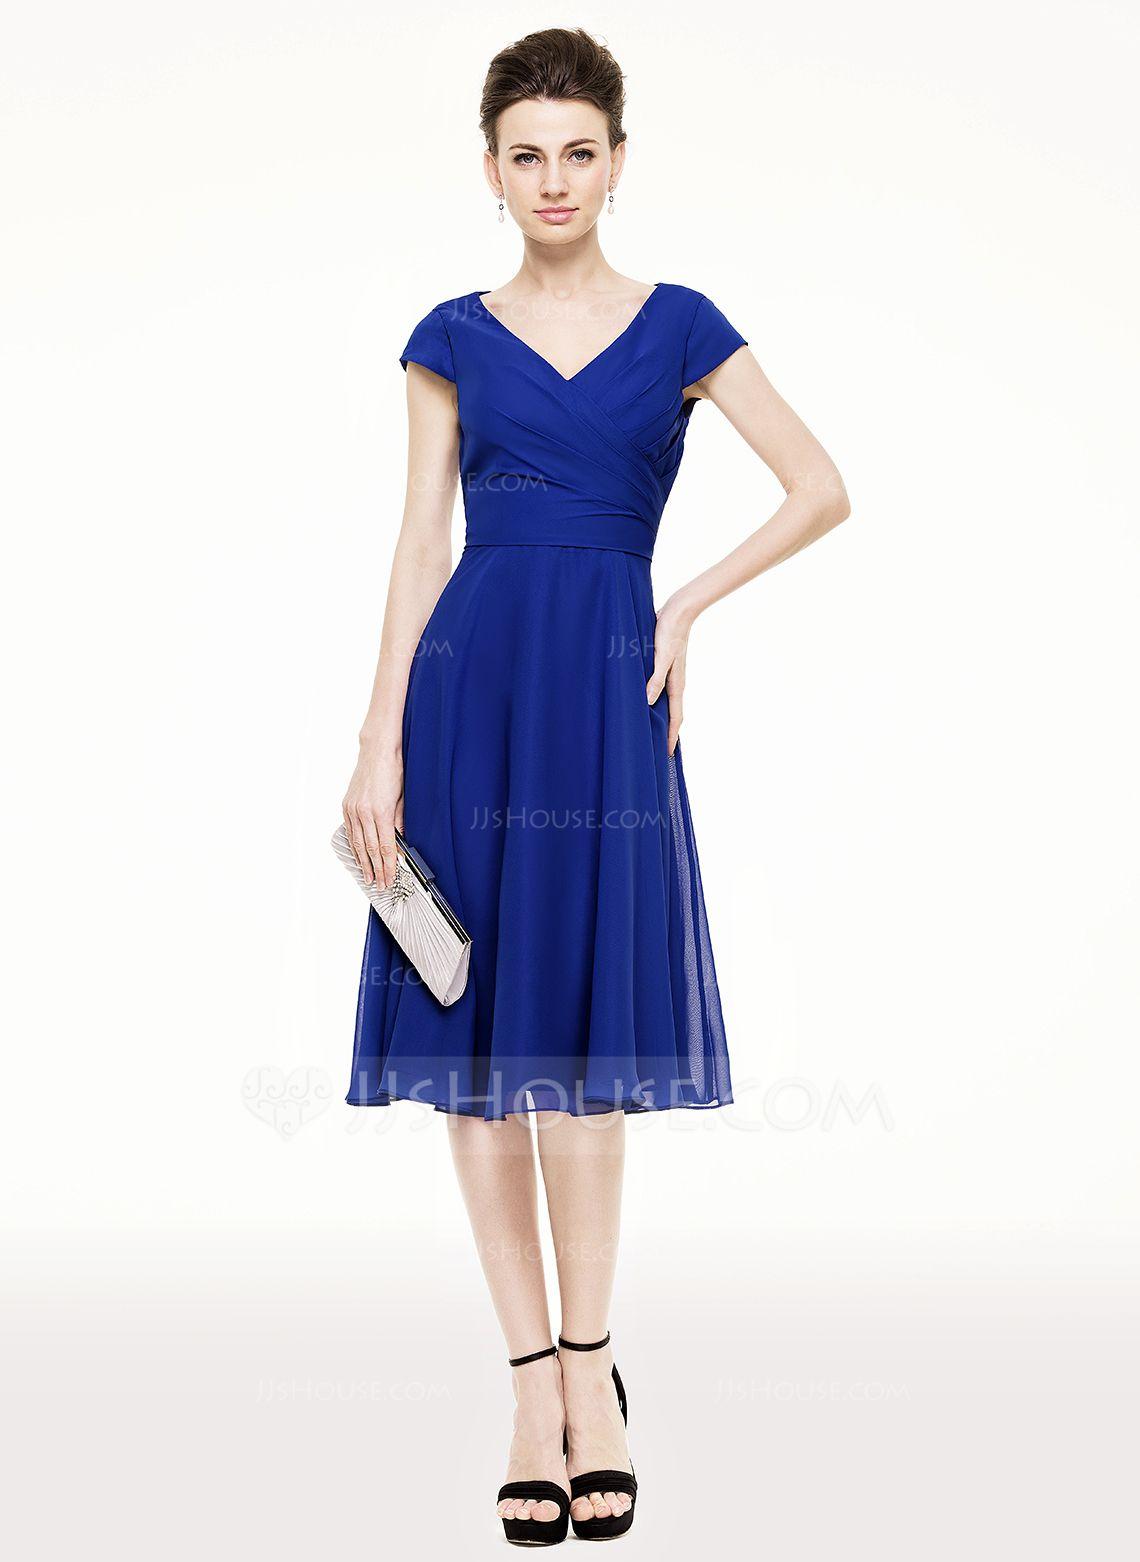 Mid length dresses for wedding guests  ALinePrincess Vneck KneeLength Chiffon Mother of the Bride Dress